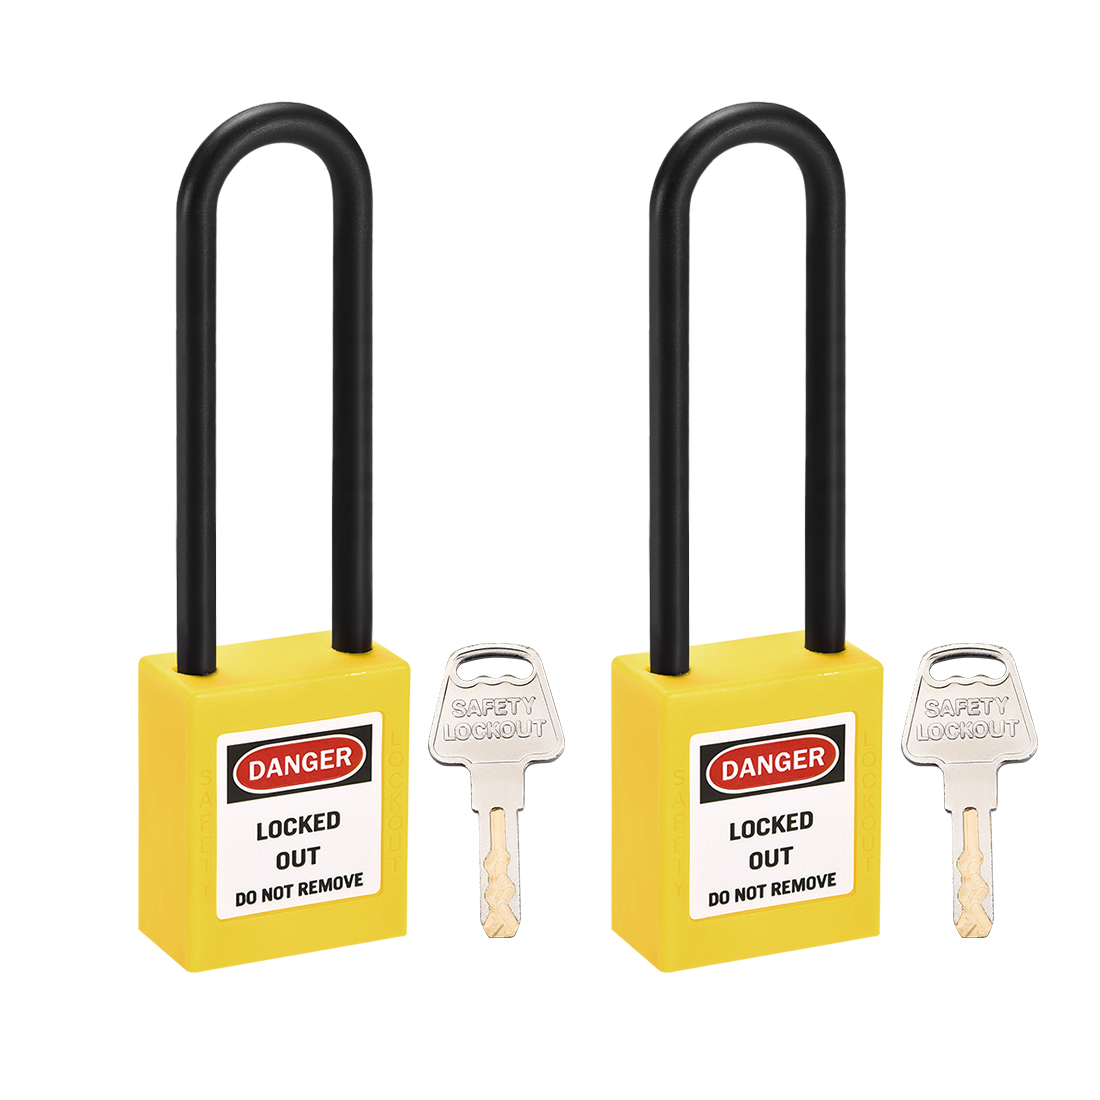 Lockout Tagout Locks 3 Inch Shackle Key Alike Safety Padlock Plastic Yellow 2pcs